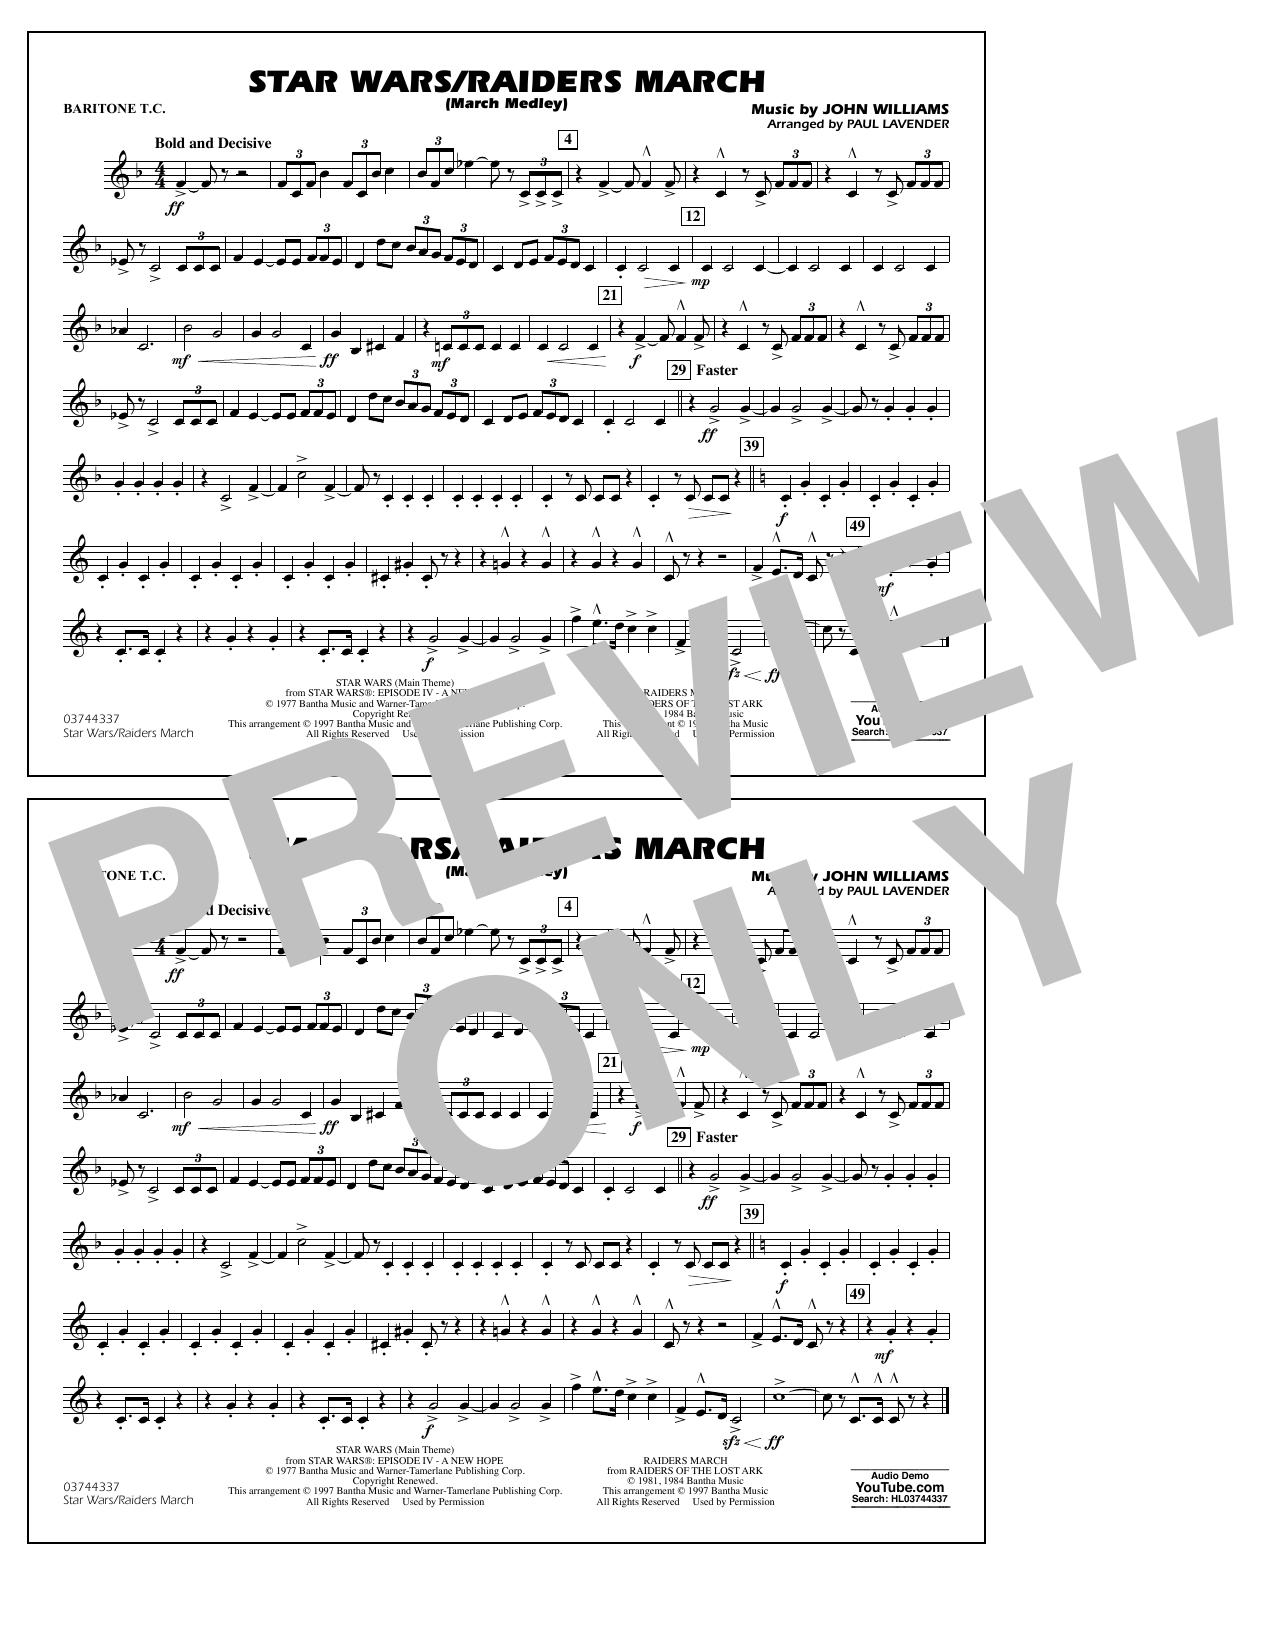 Star Wars/Raiders March - Baritone T.C. Sheet Music